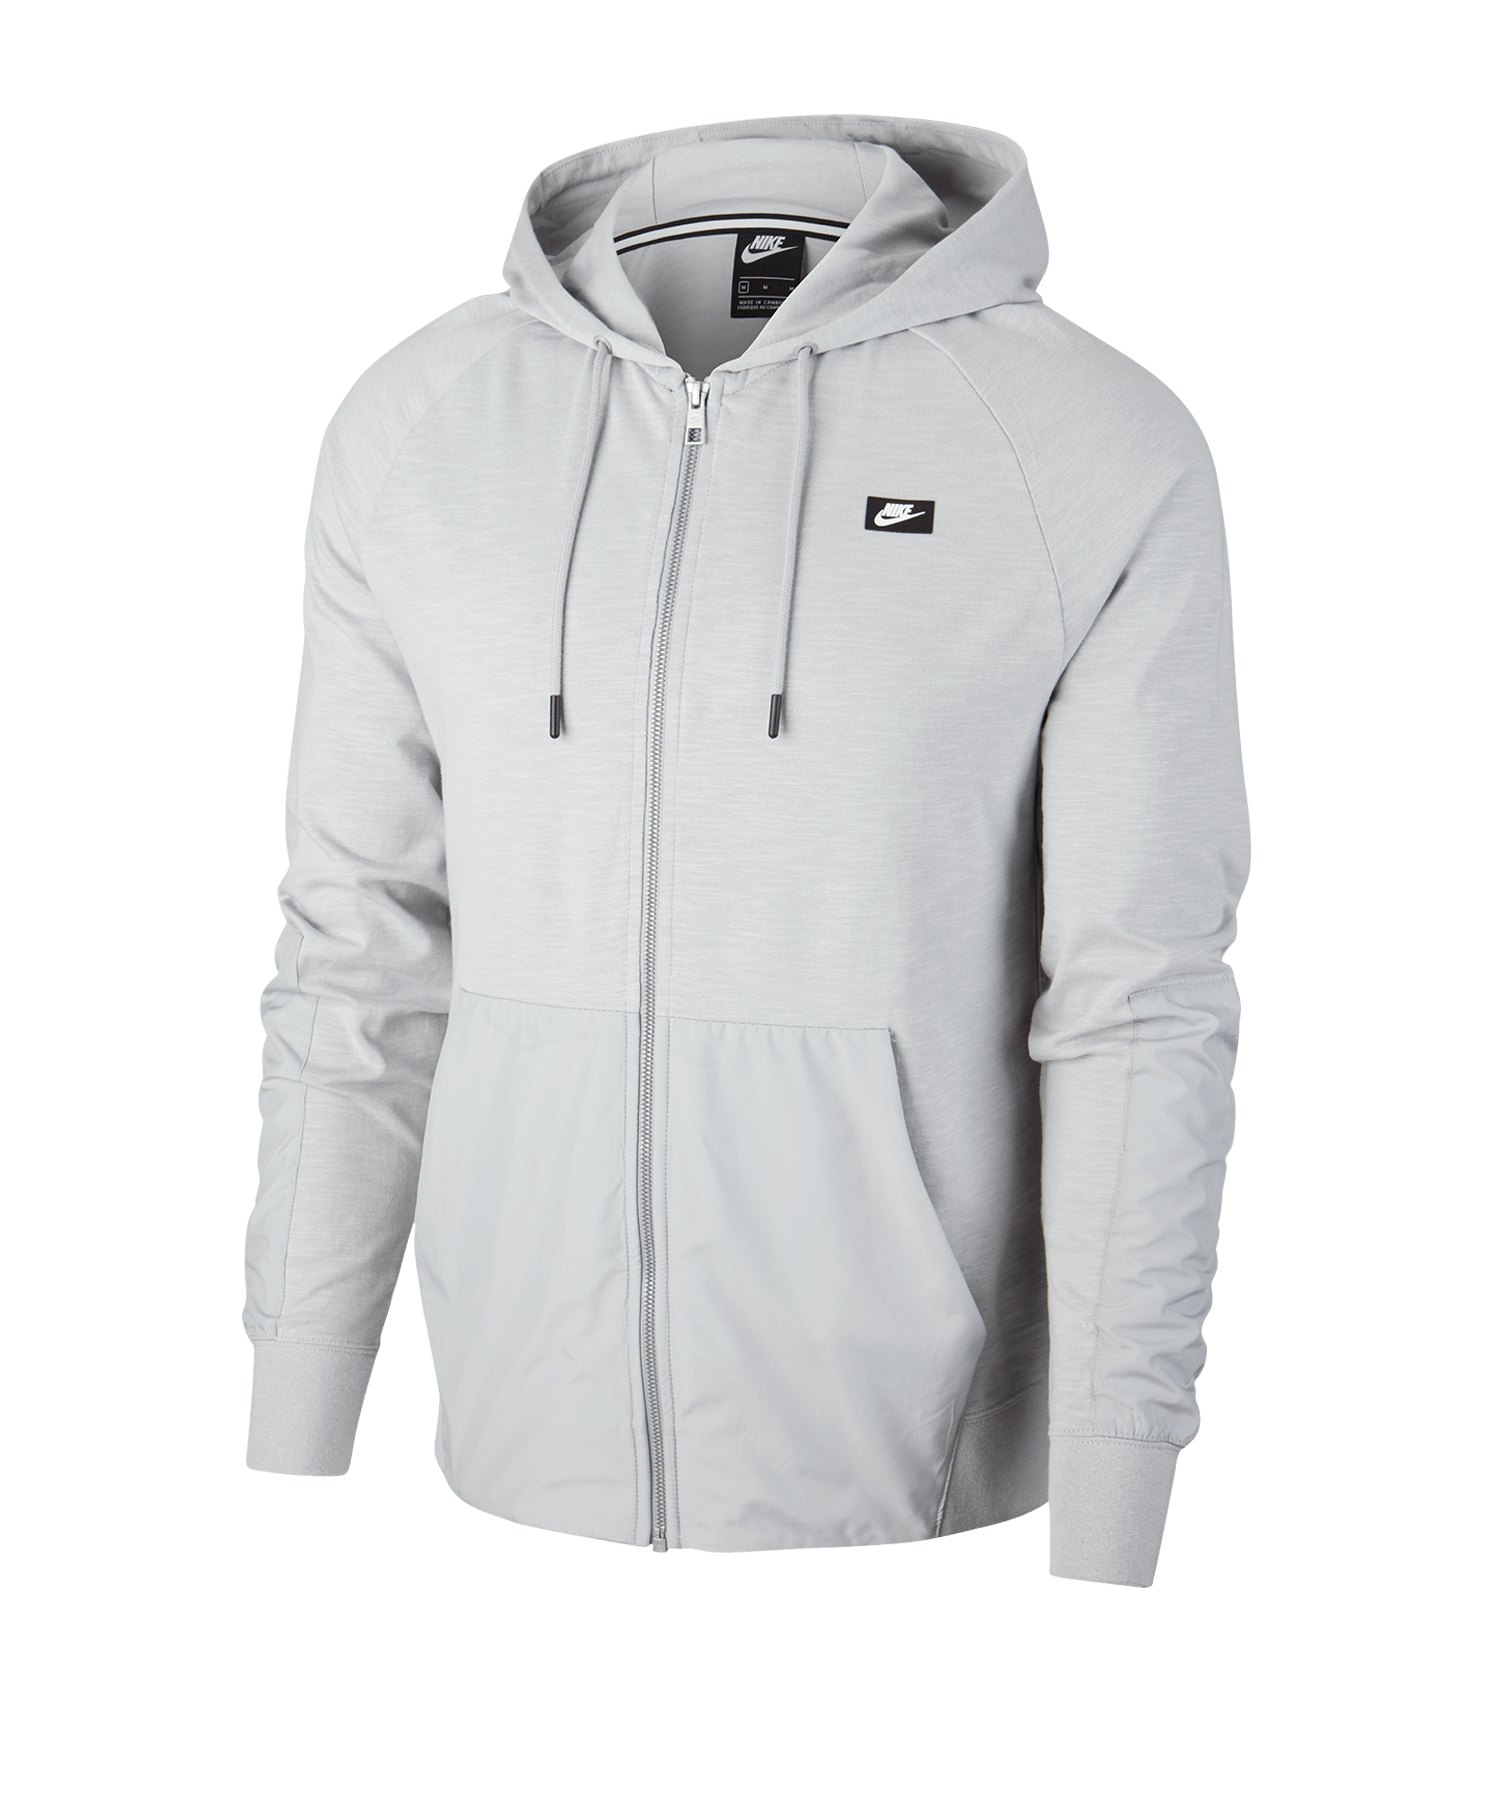 Nike Mix Kapuzenjacke Grau F077 - grau